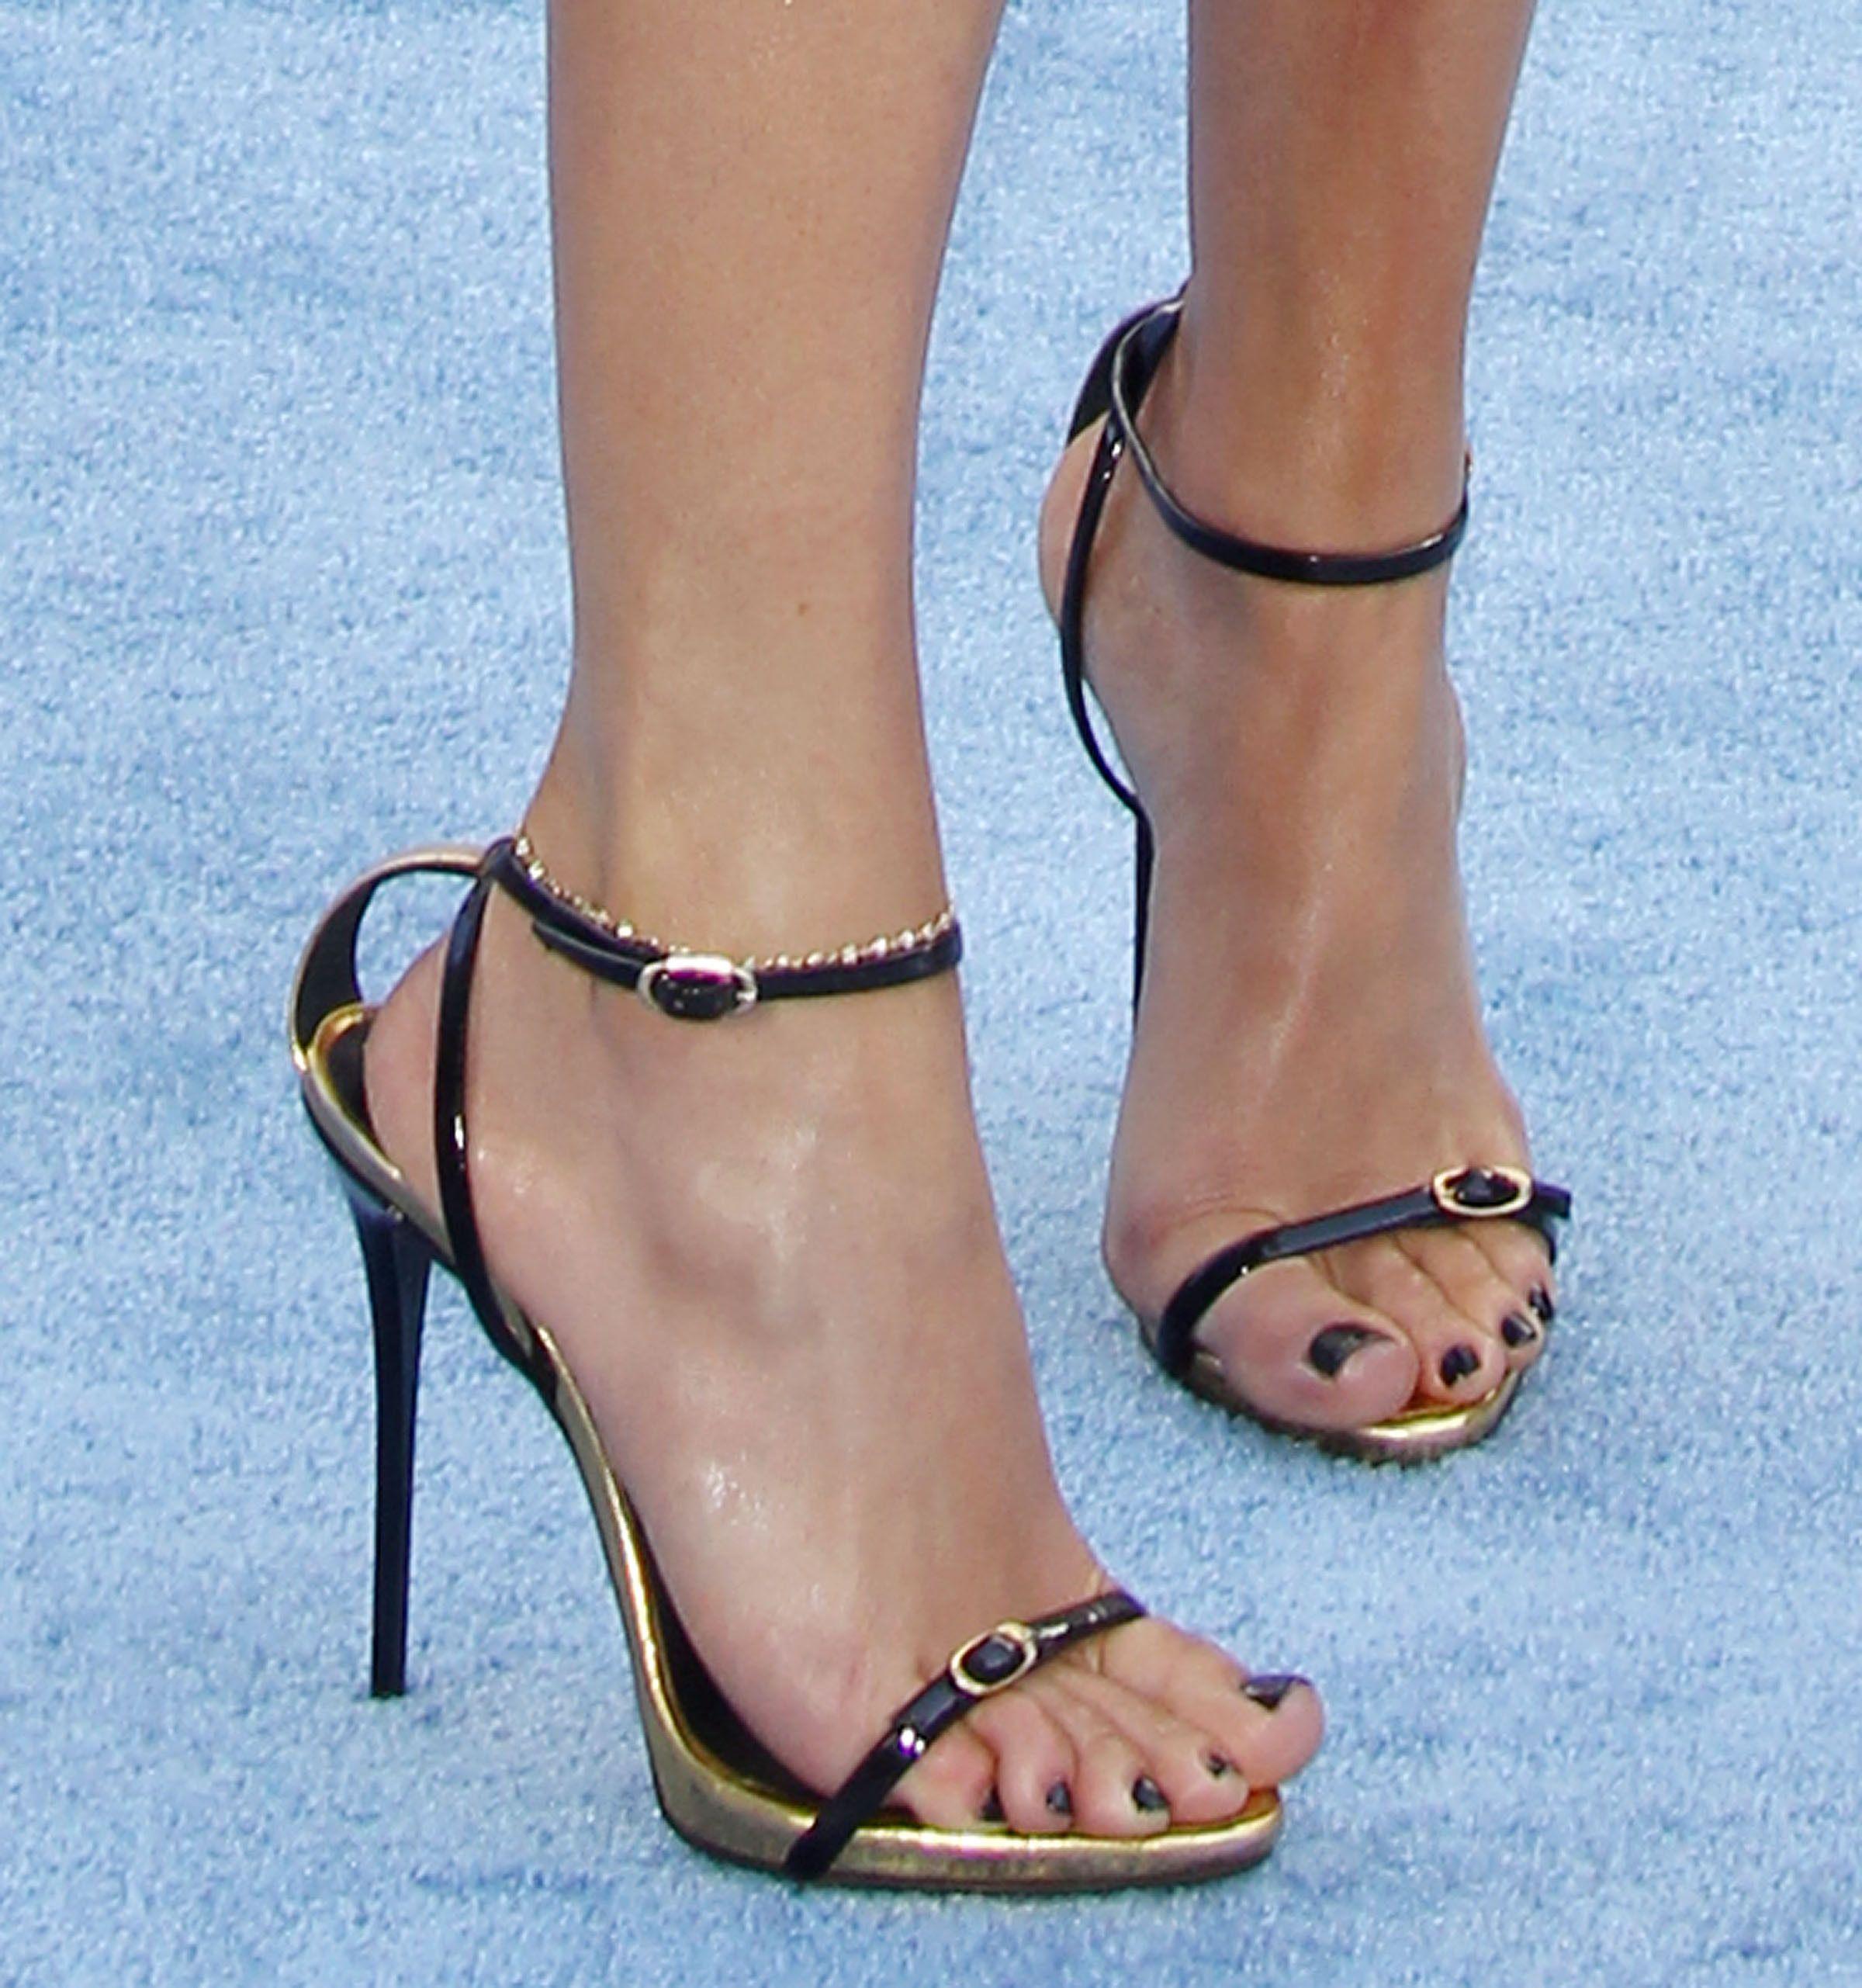 Barefoot Shoes Toronto